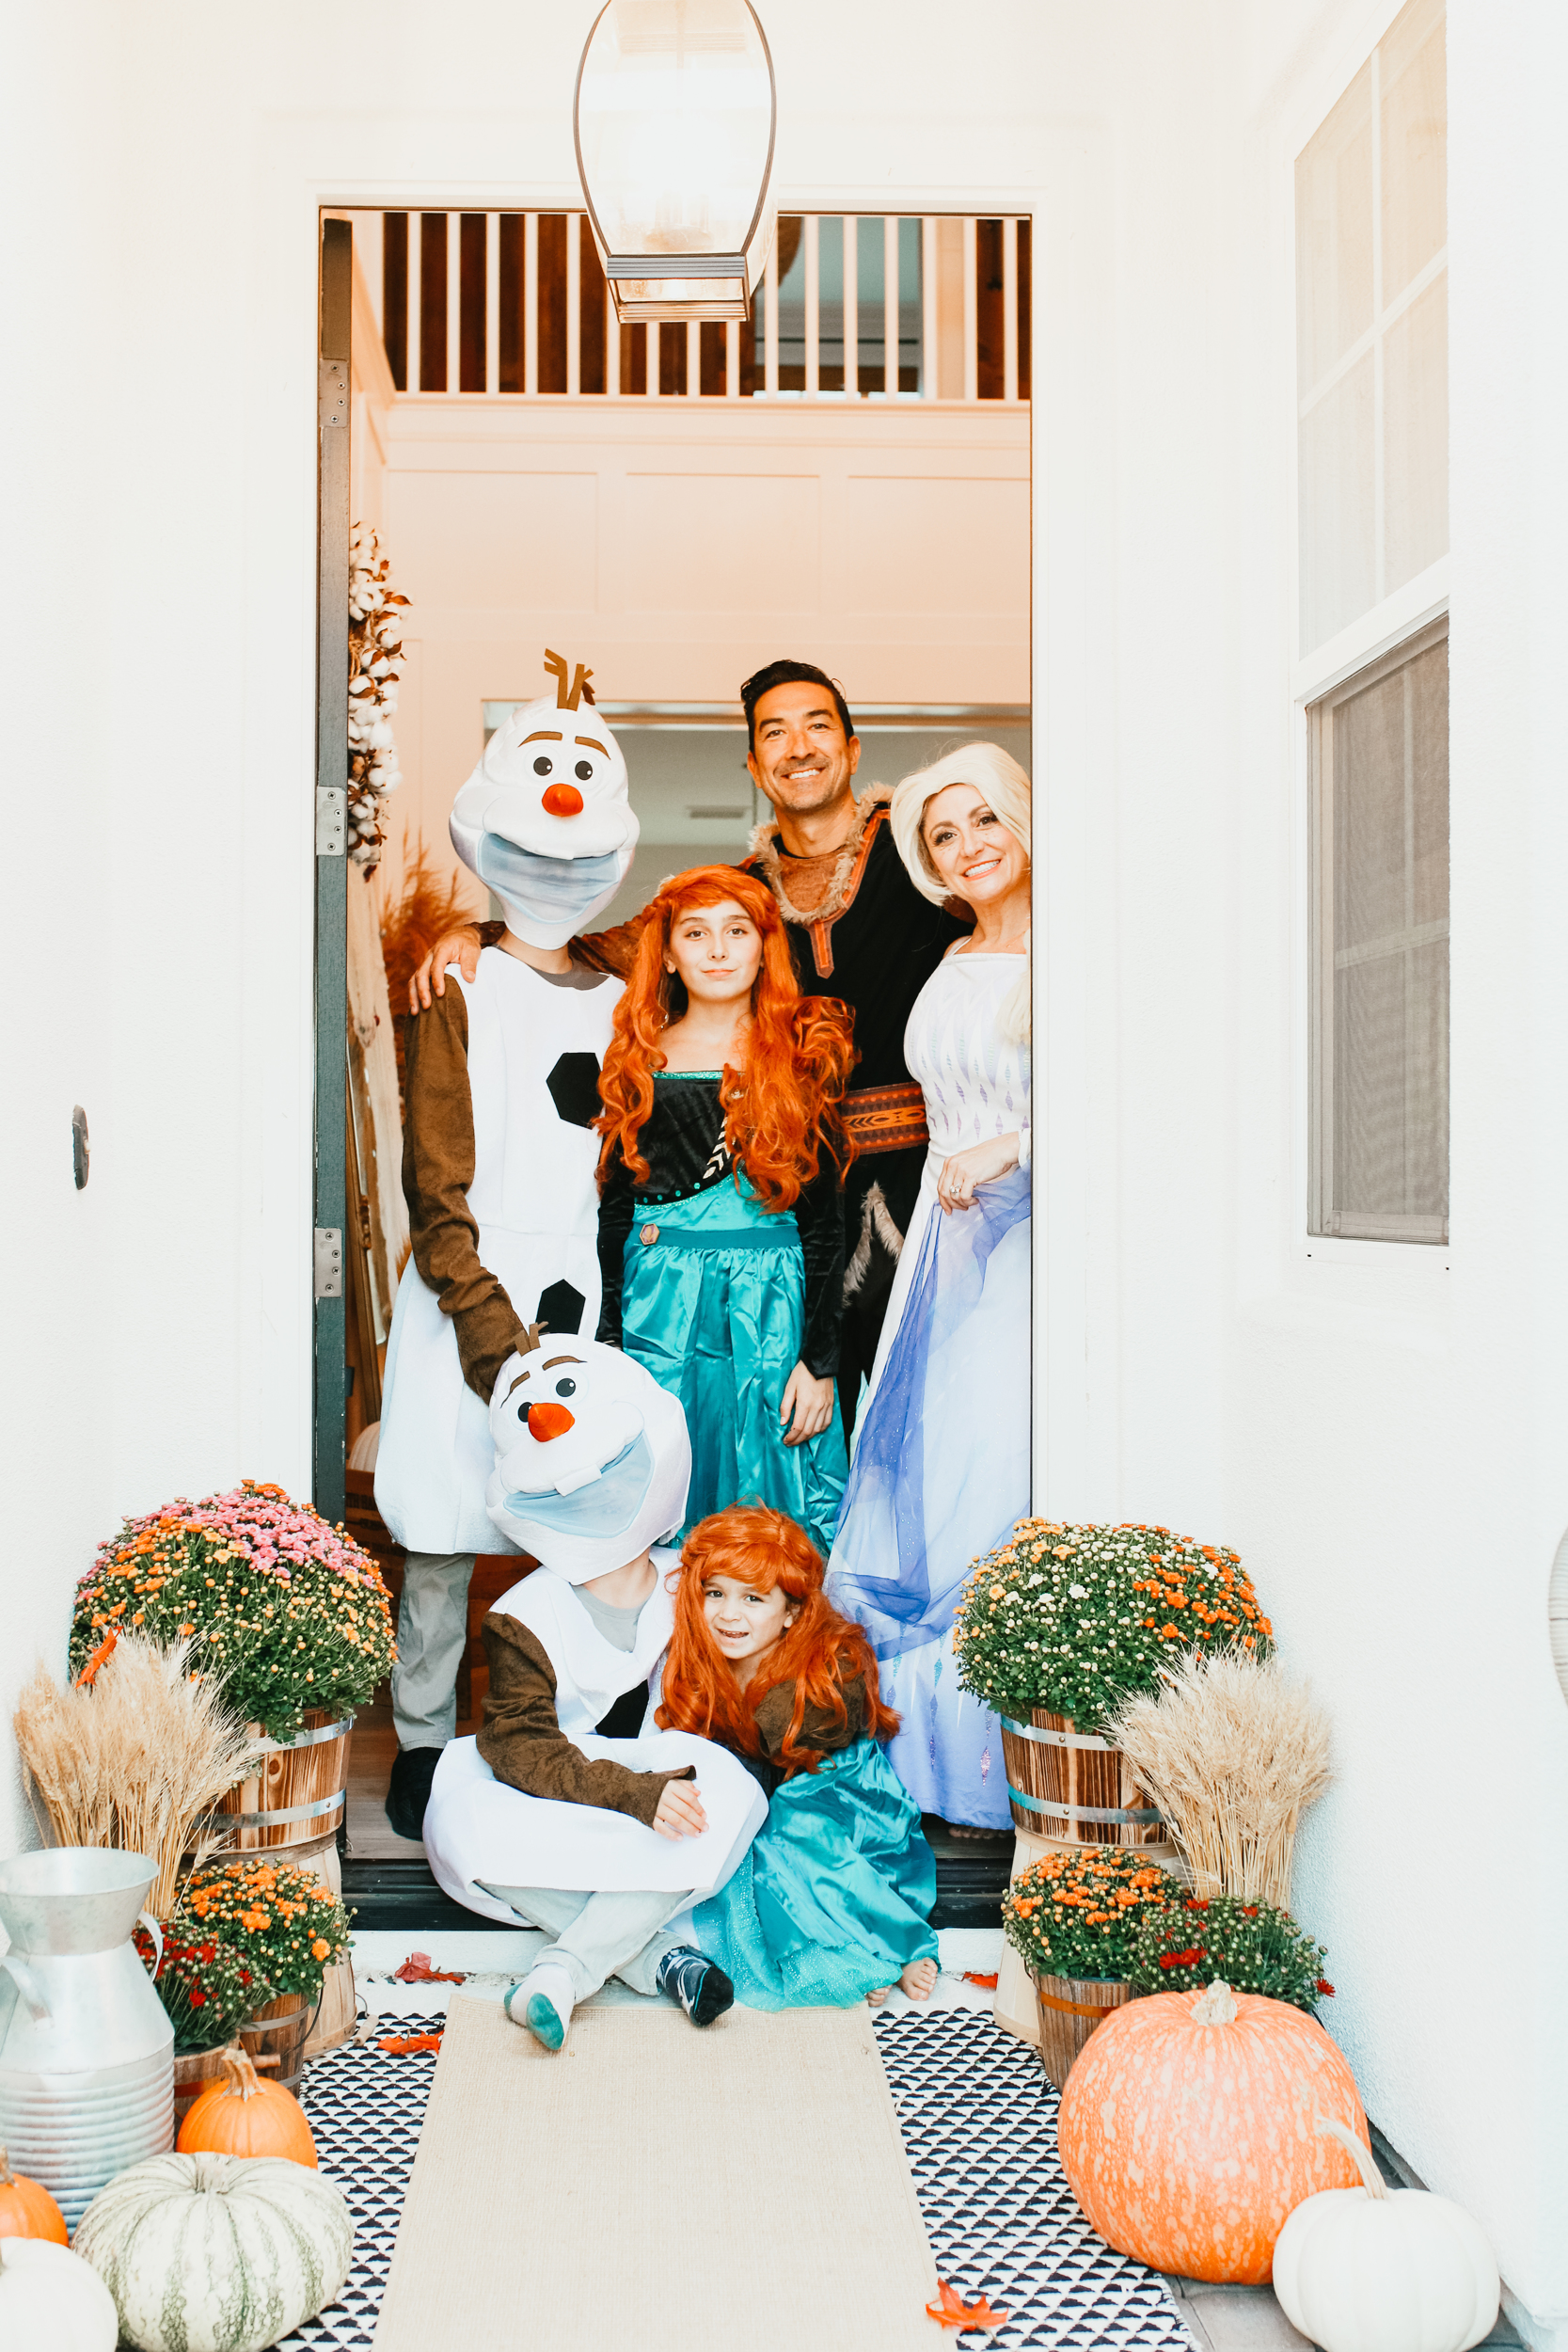 disney frozen family in costumes